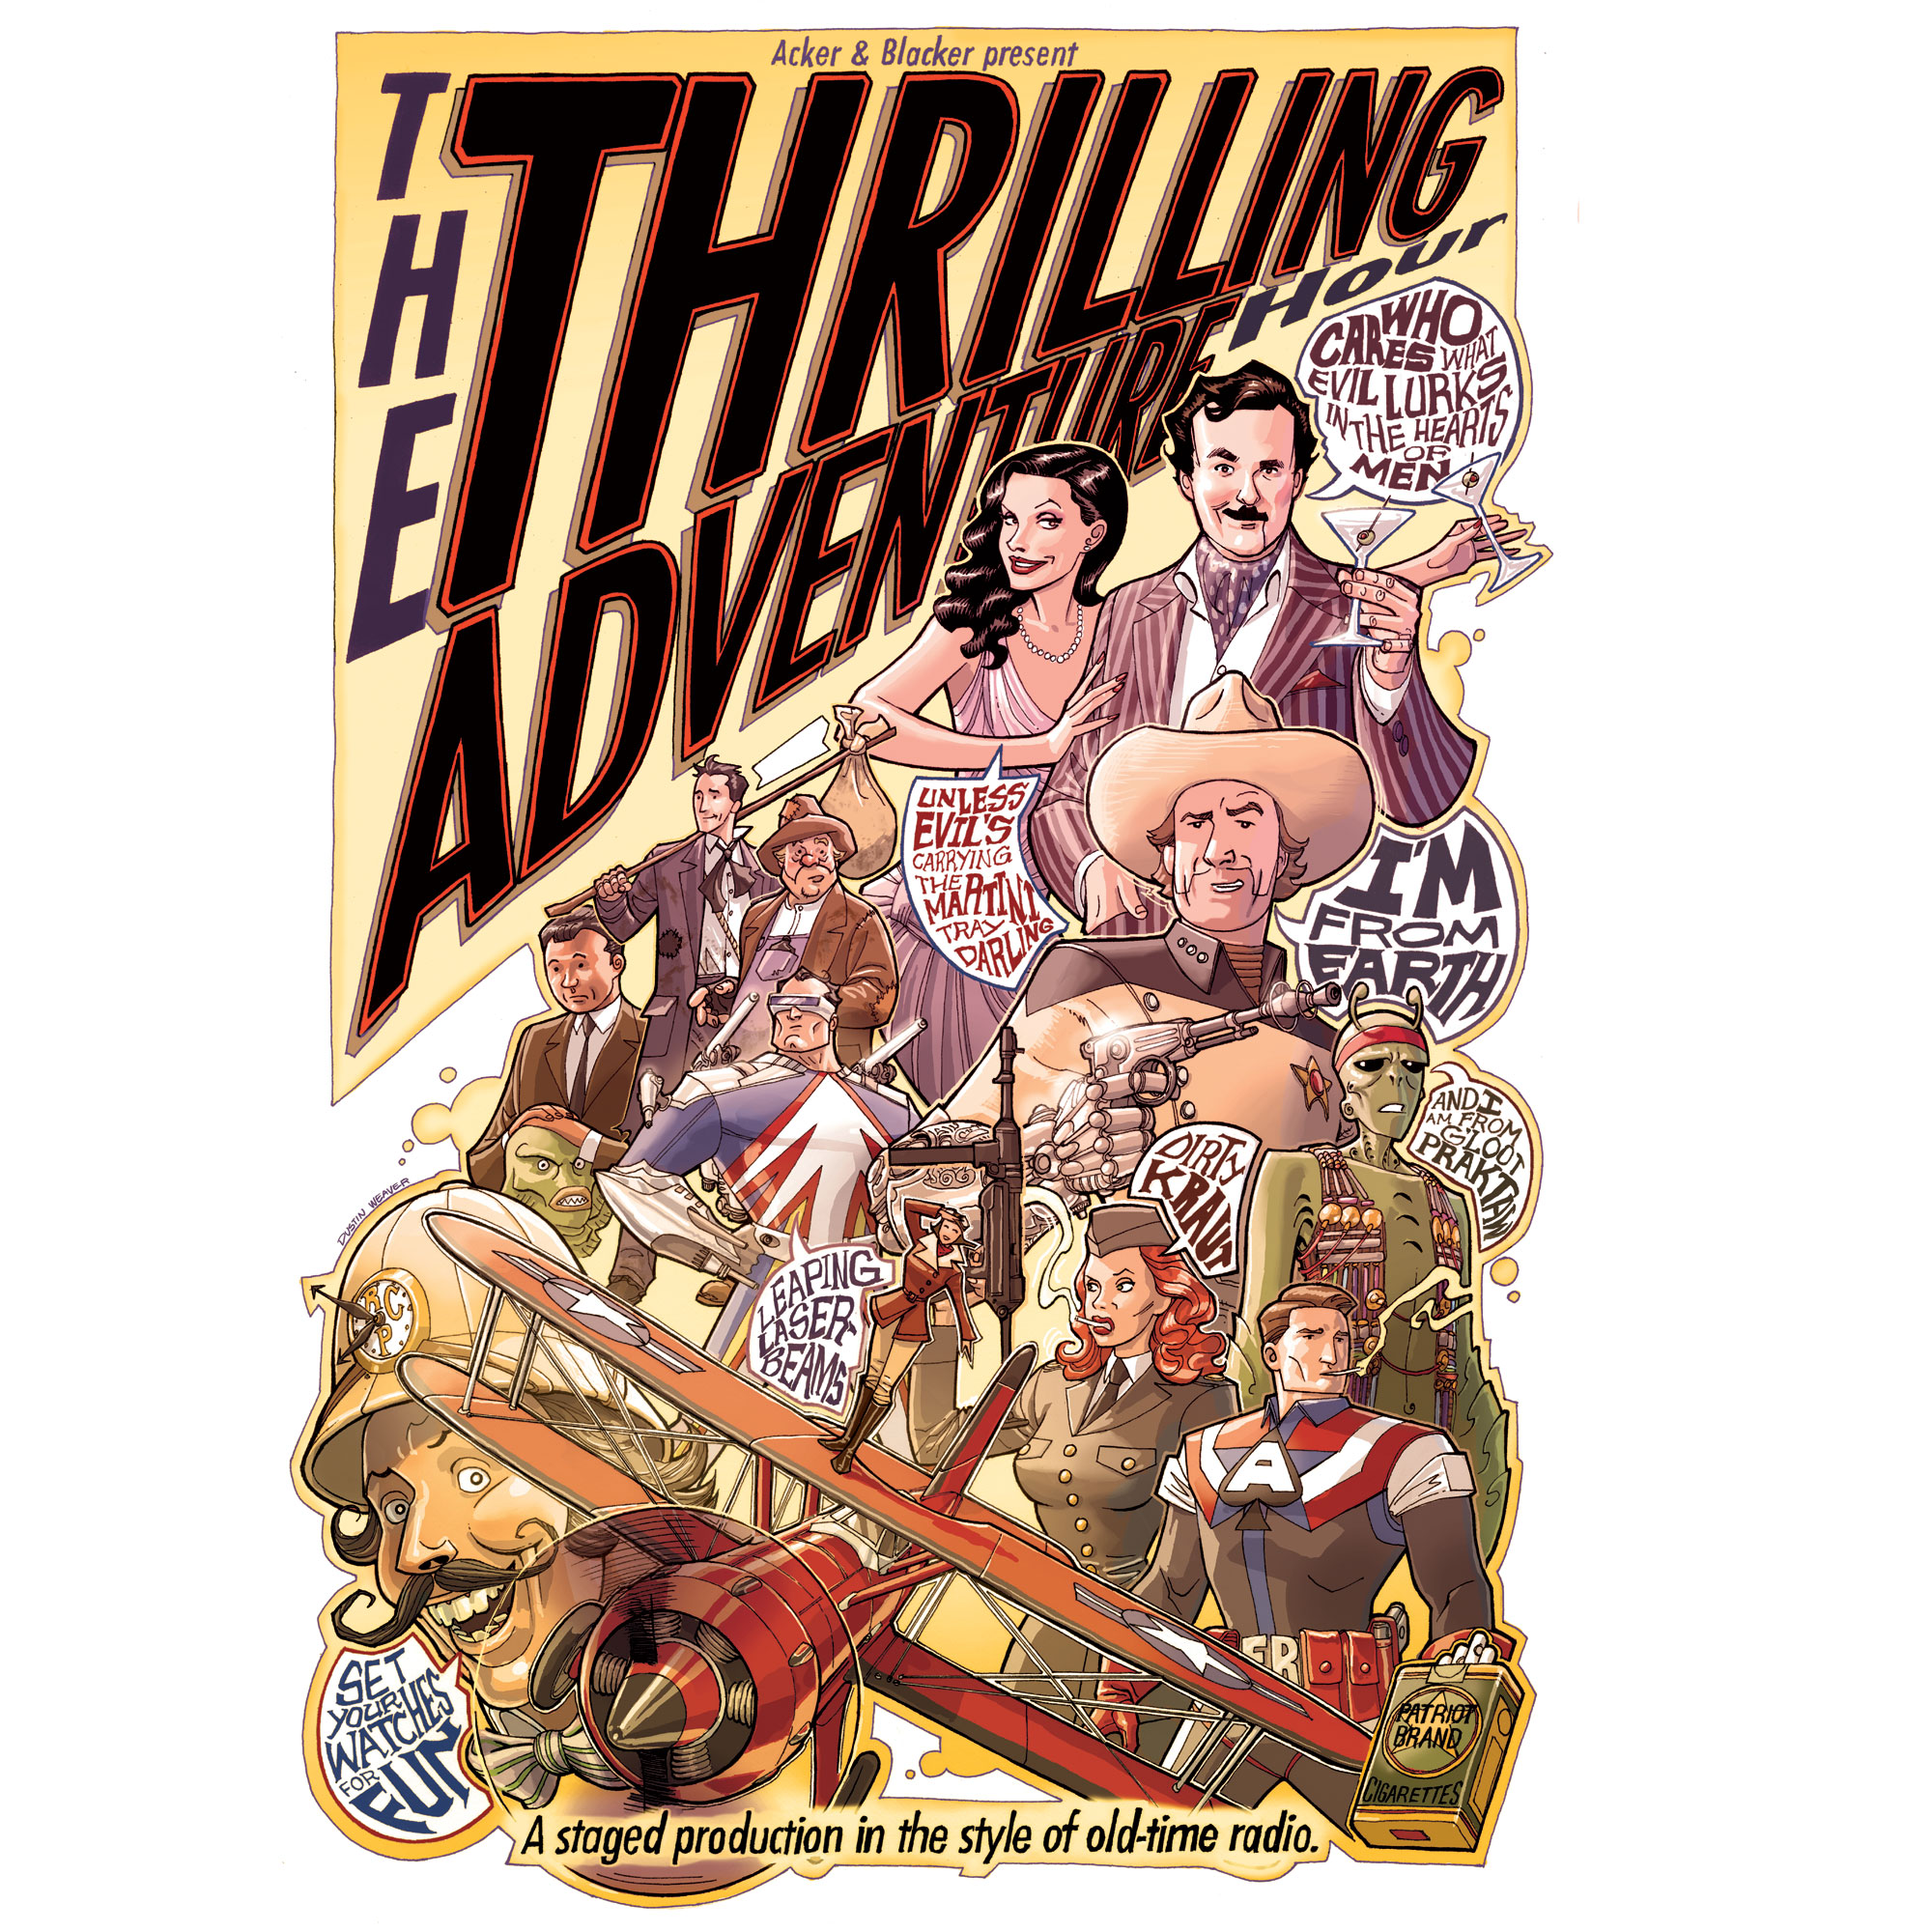 The Thrilling Adventure Graphic Novel - Jun 29 – Oct 20, 2013